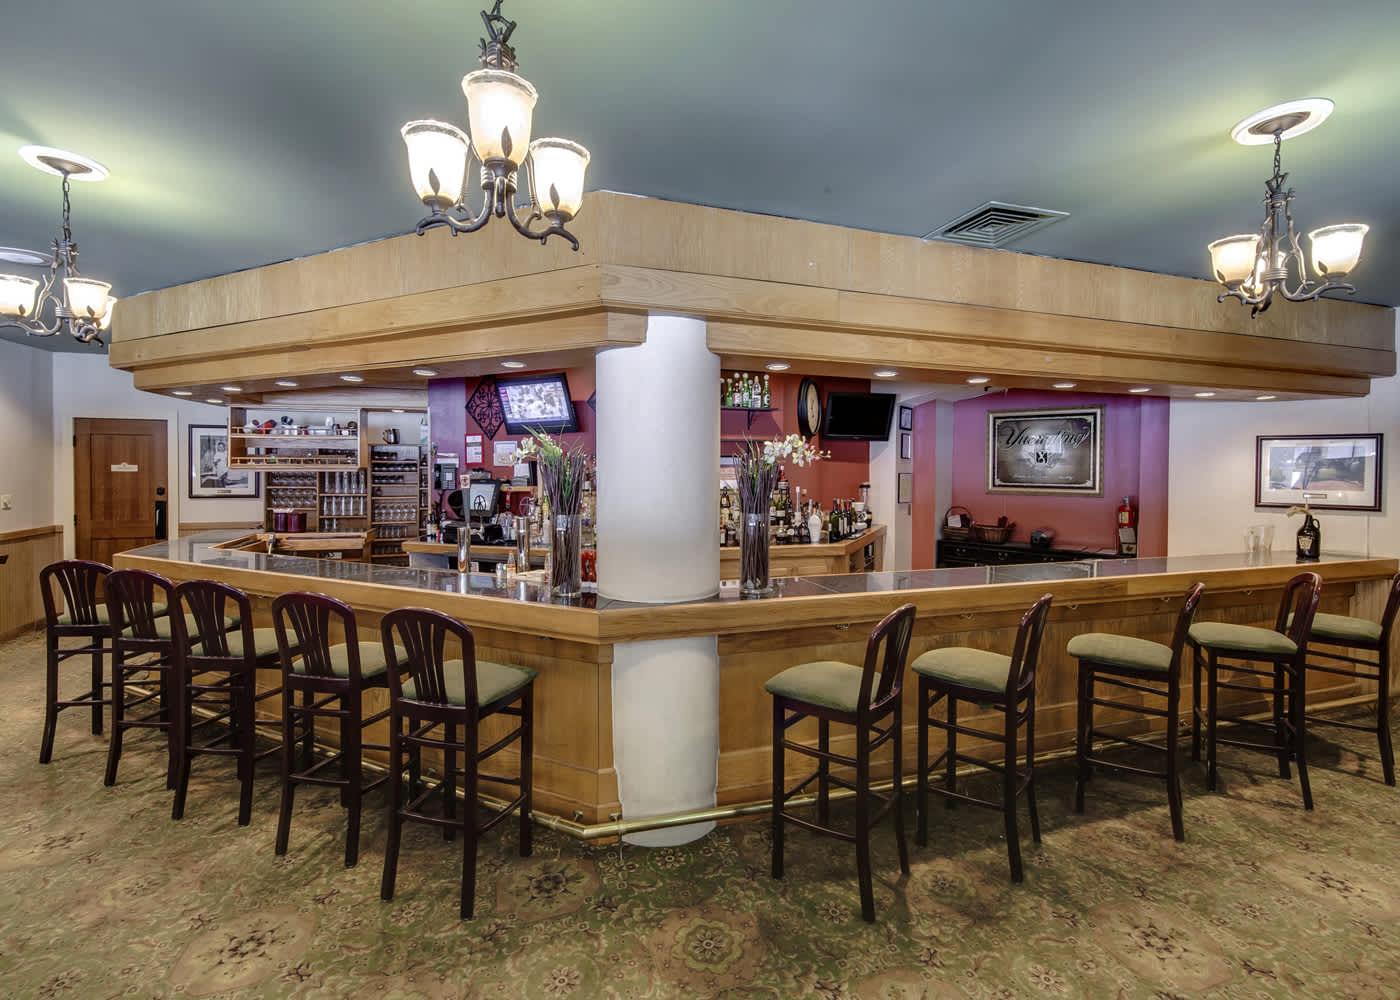 The Shawnee Inn Dining